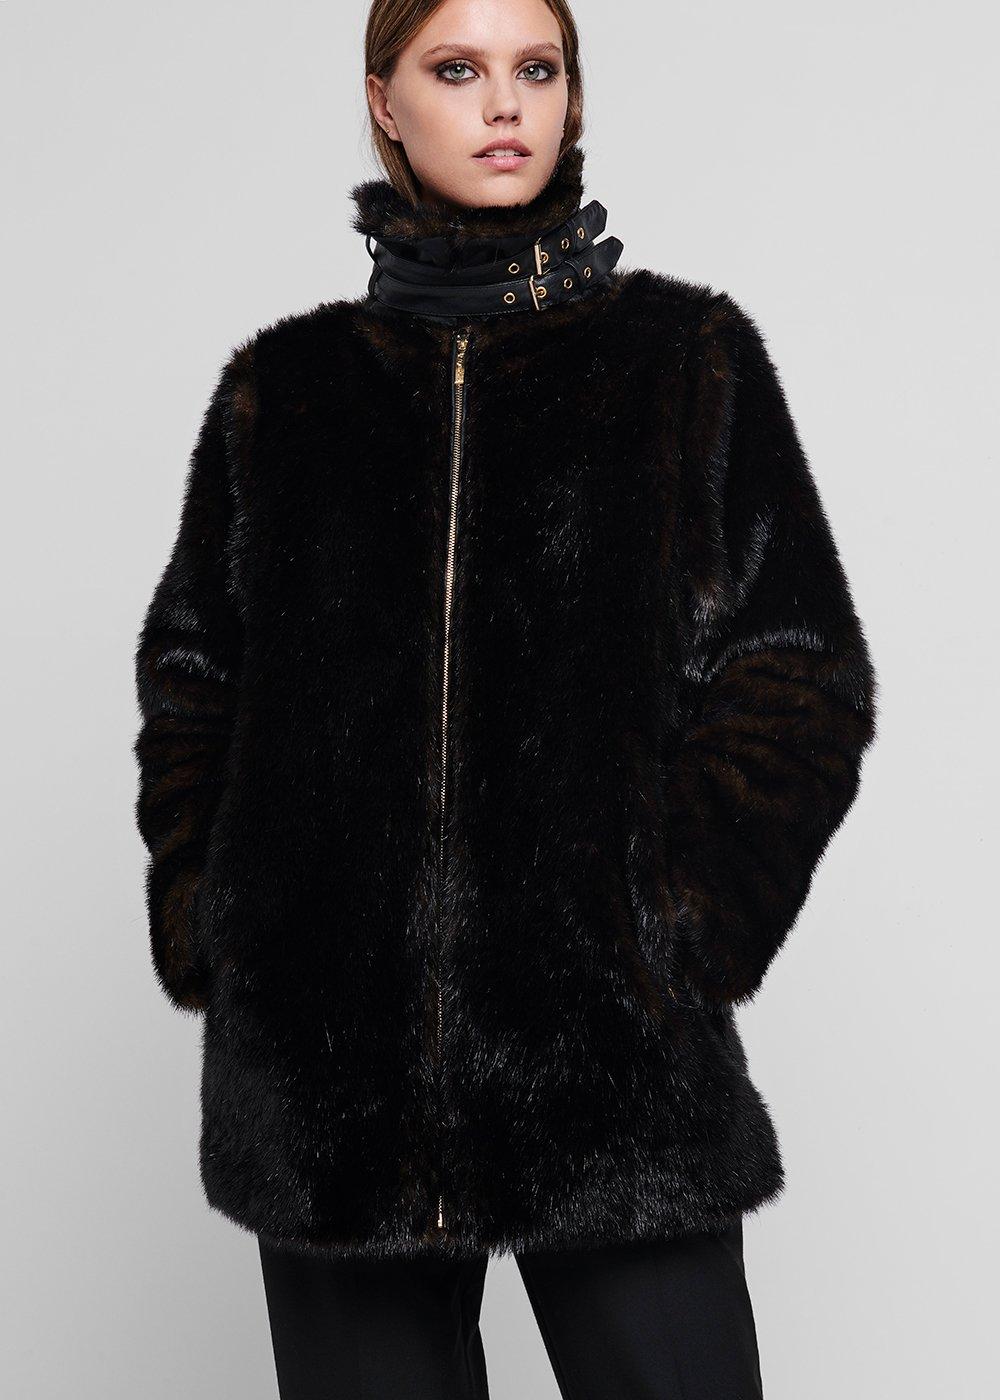 Beaver - effect faux fur coat - Black - Woman